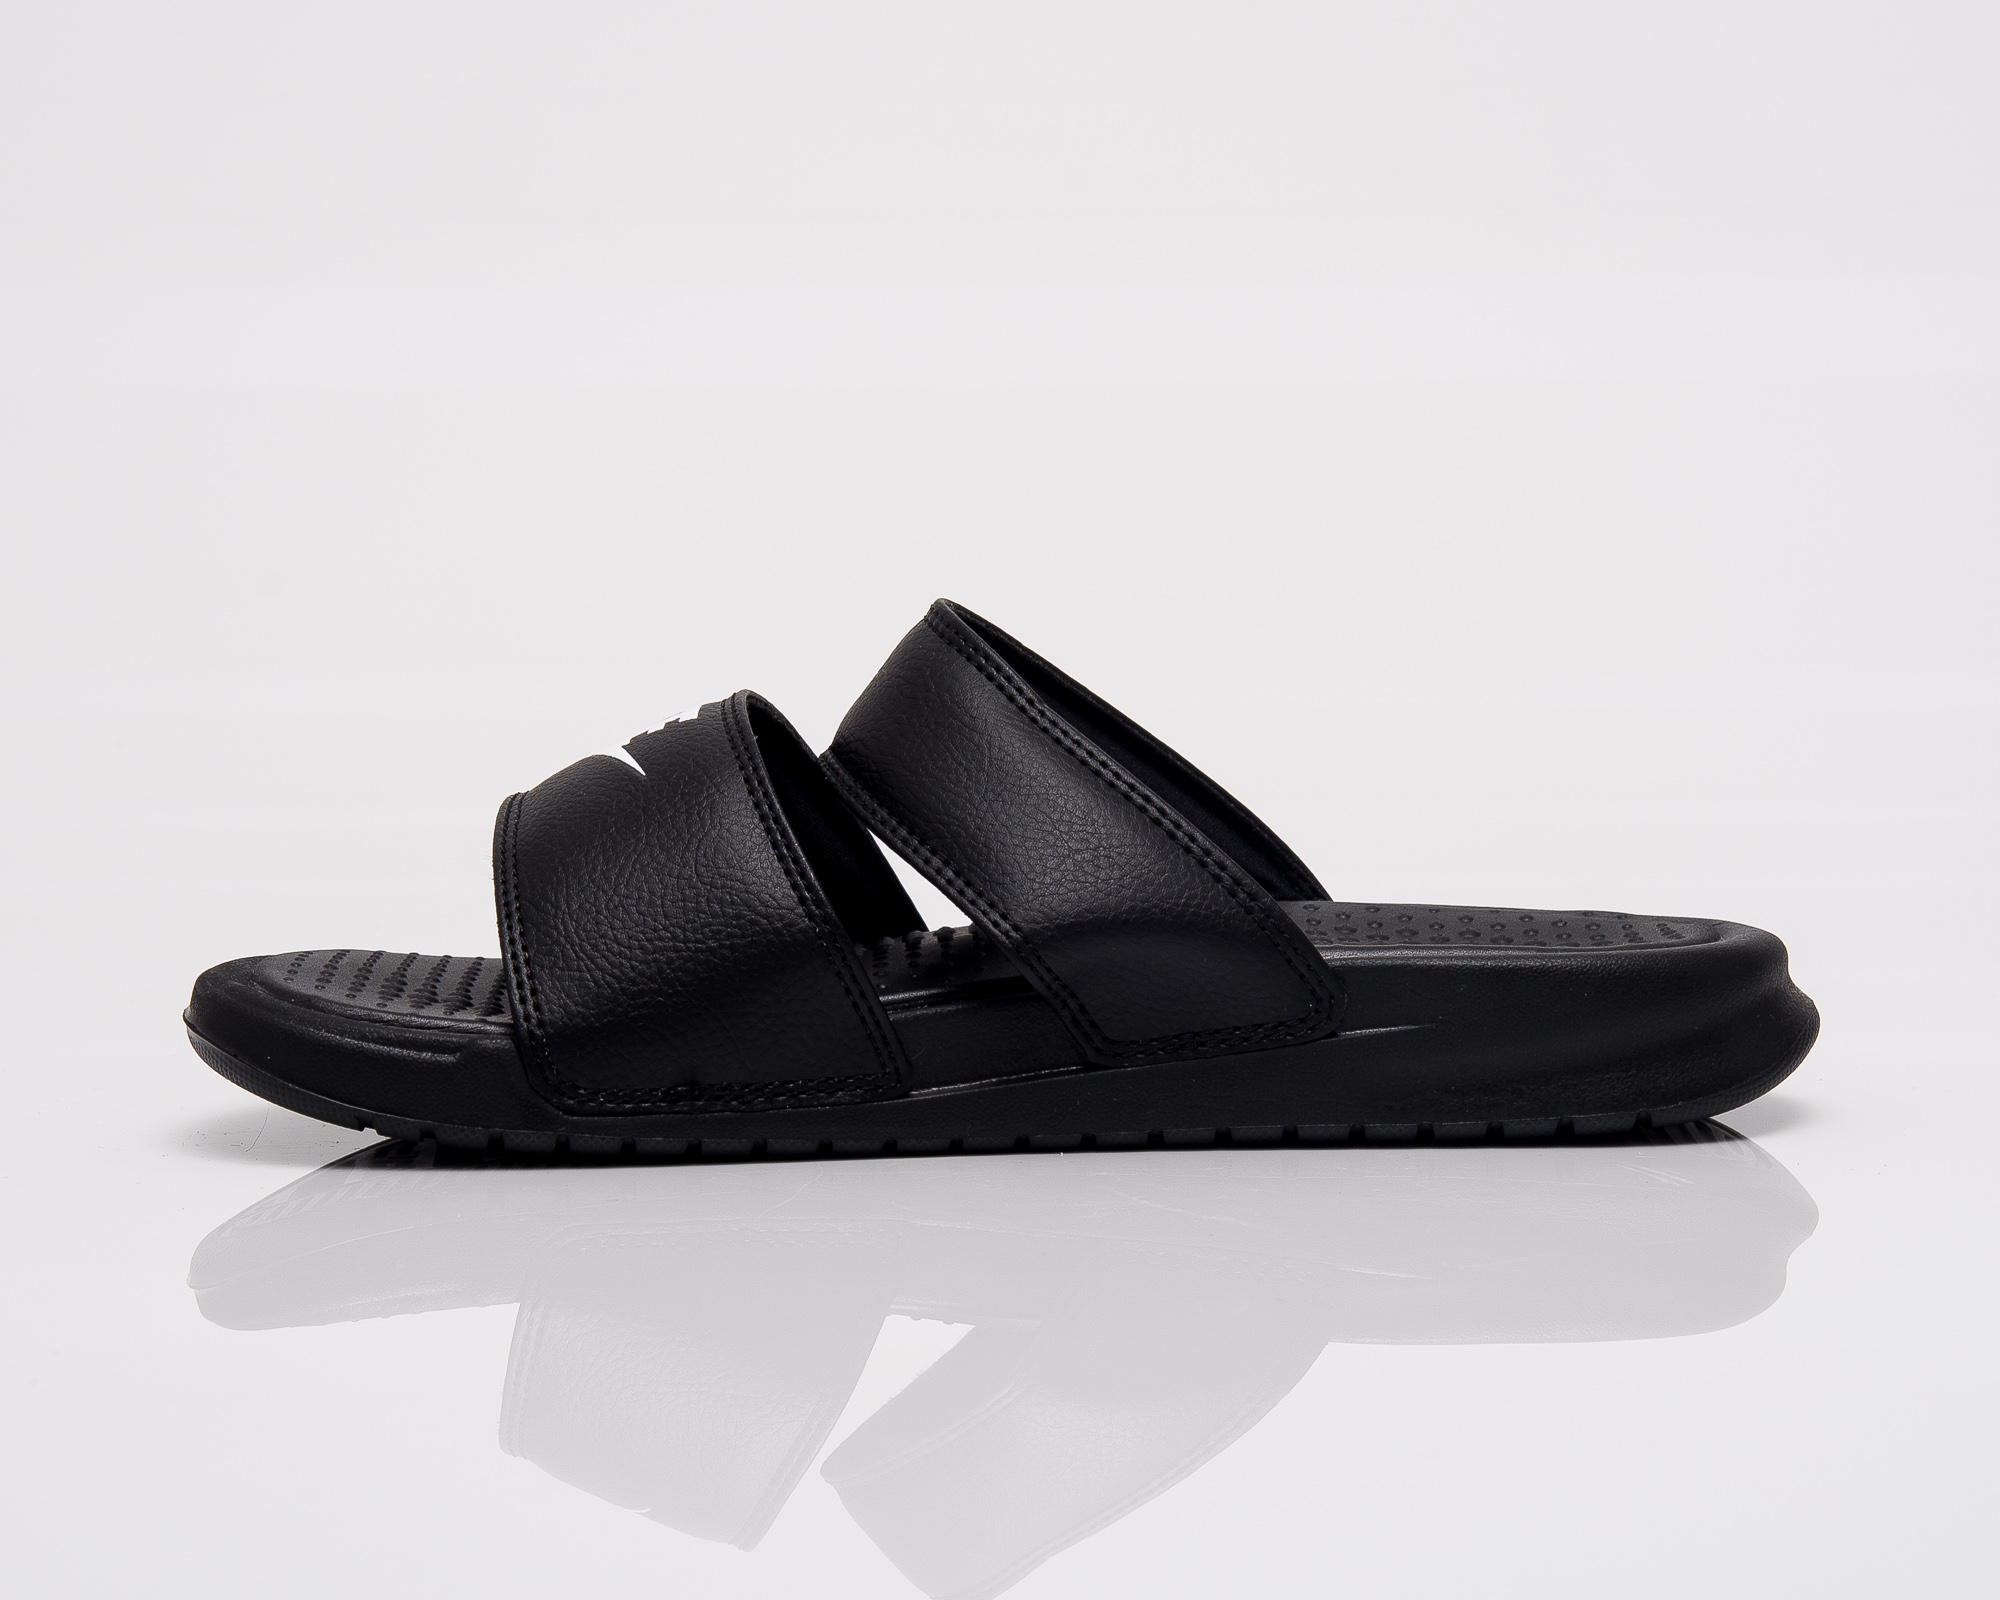 90b7ded16523 Nike Wmns Benassi Duo Ultra Slide - Shoes Slides - Sporting goods ...